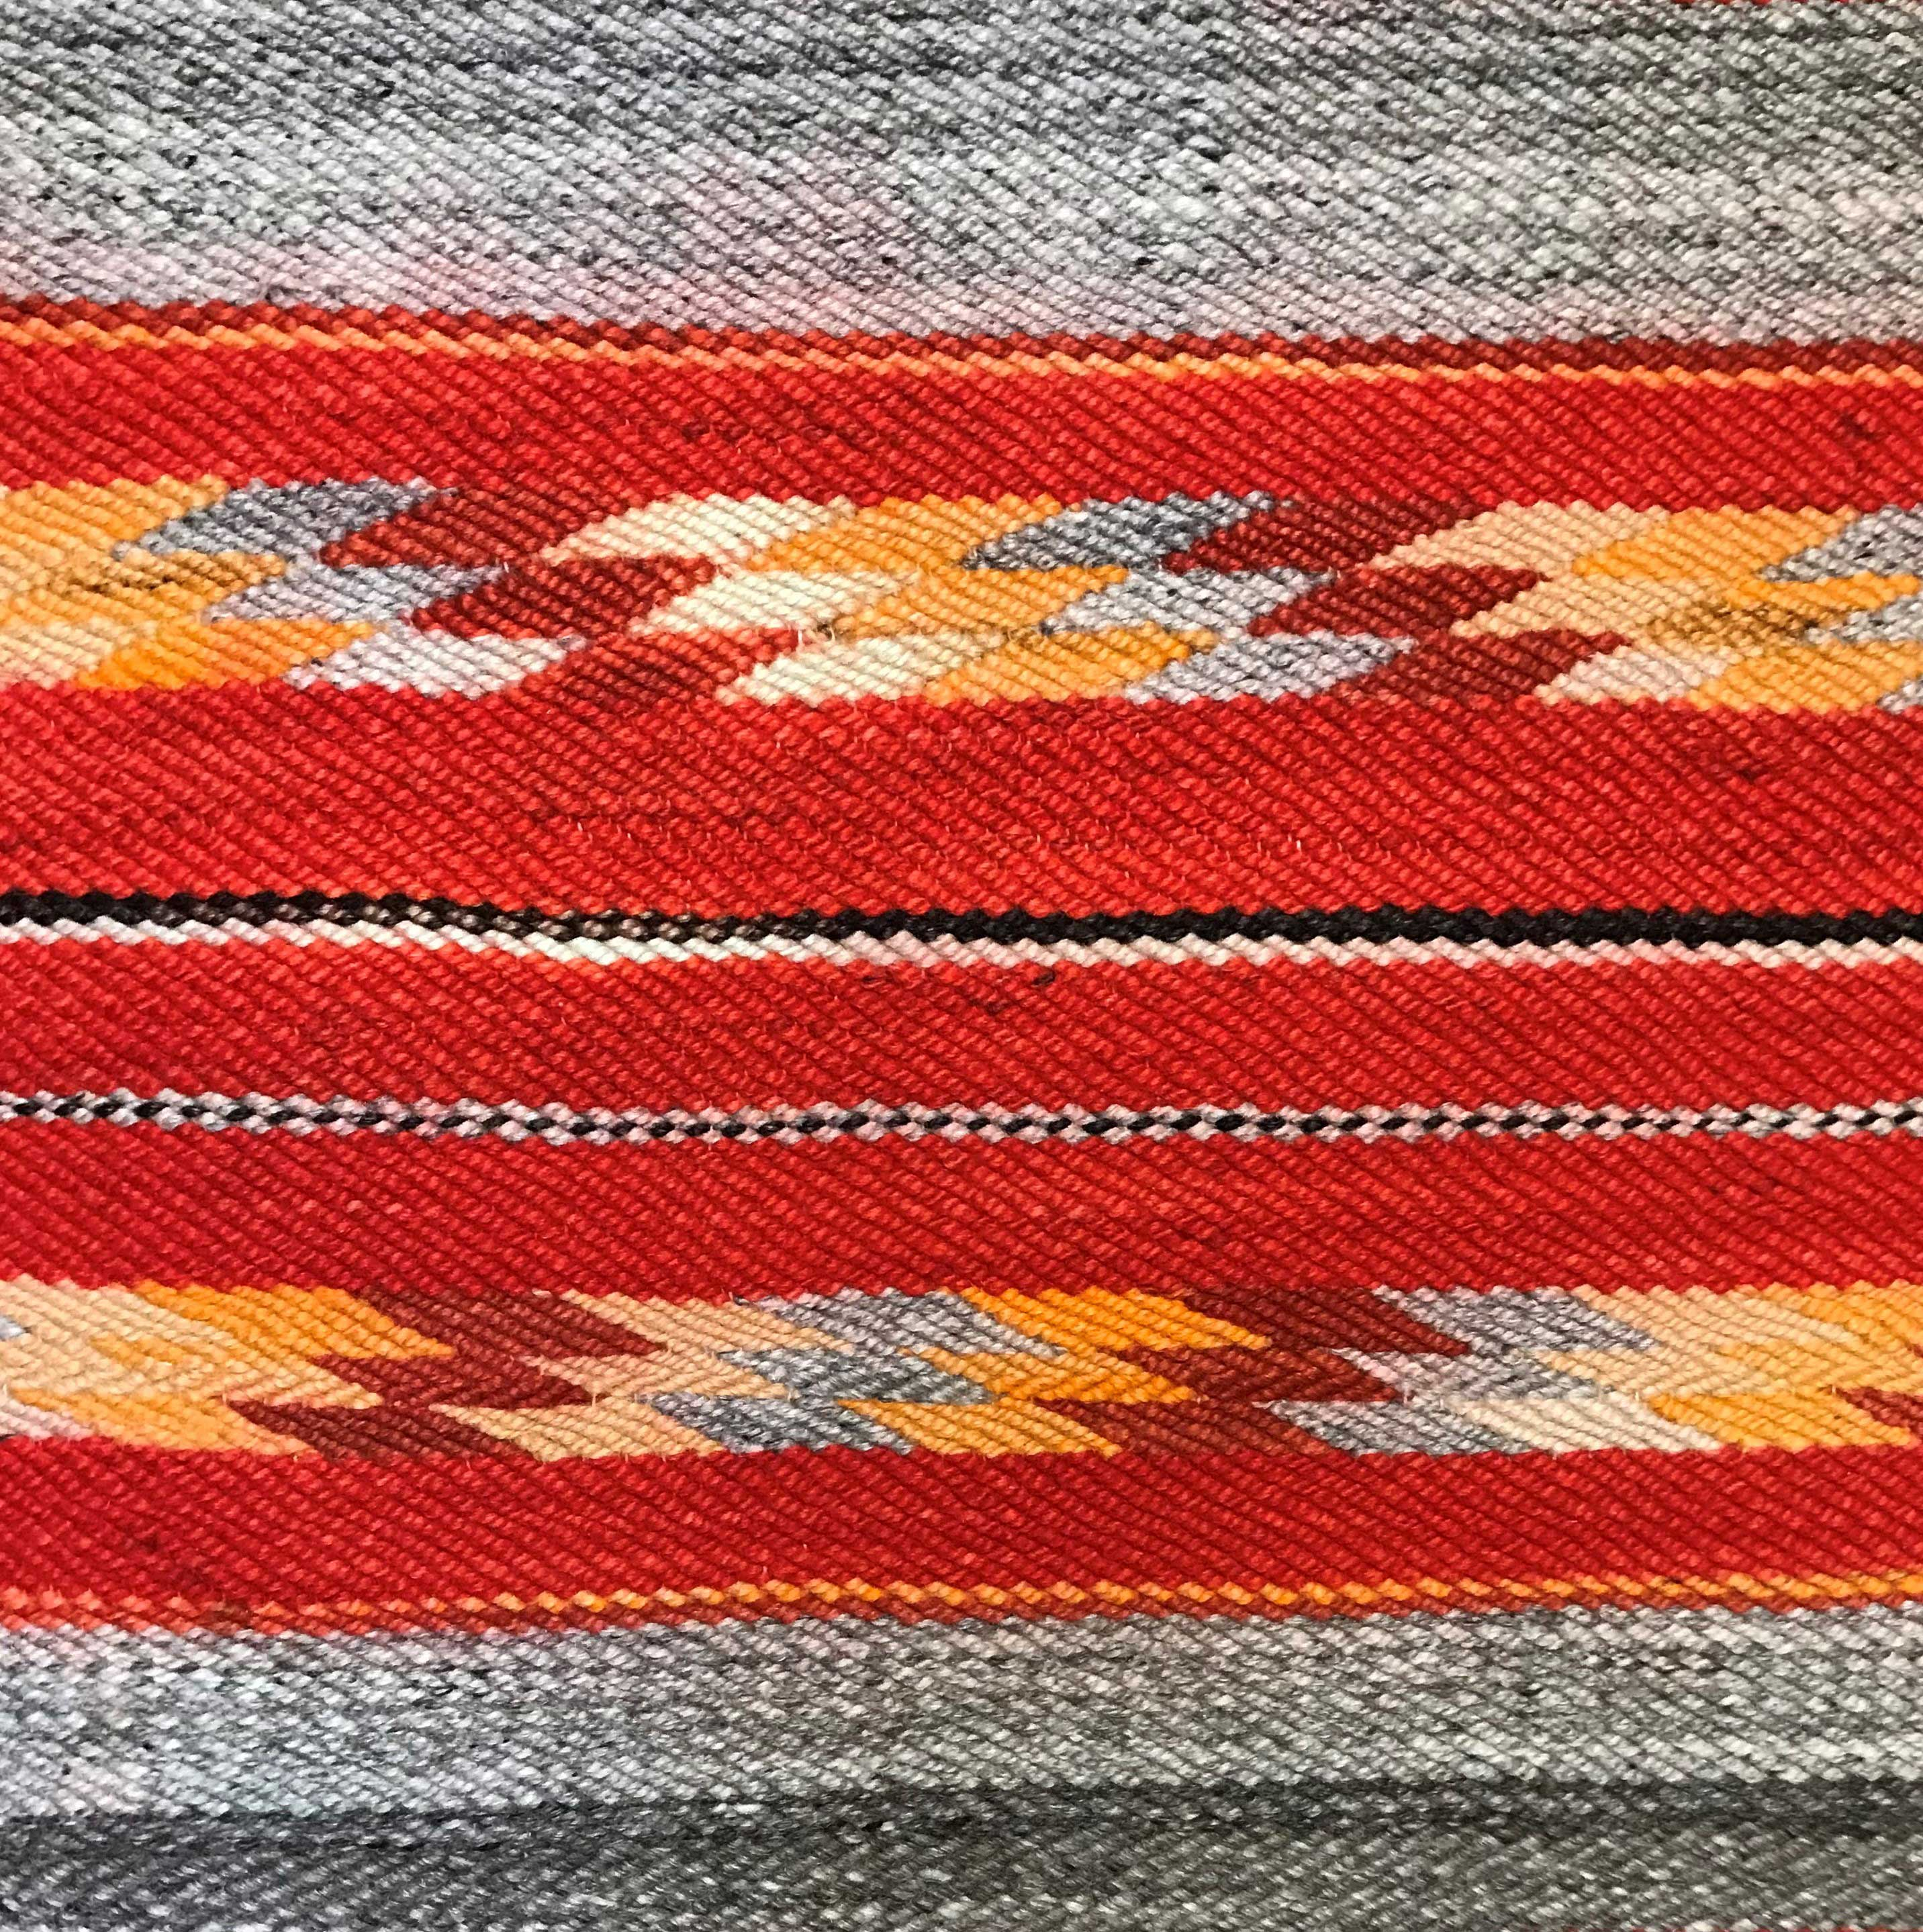 Transitional Navajo Saddle Blanket With Diagonal Weave 329